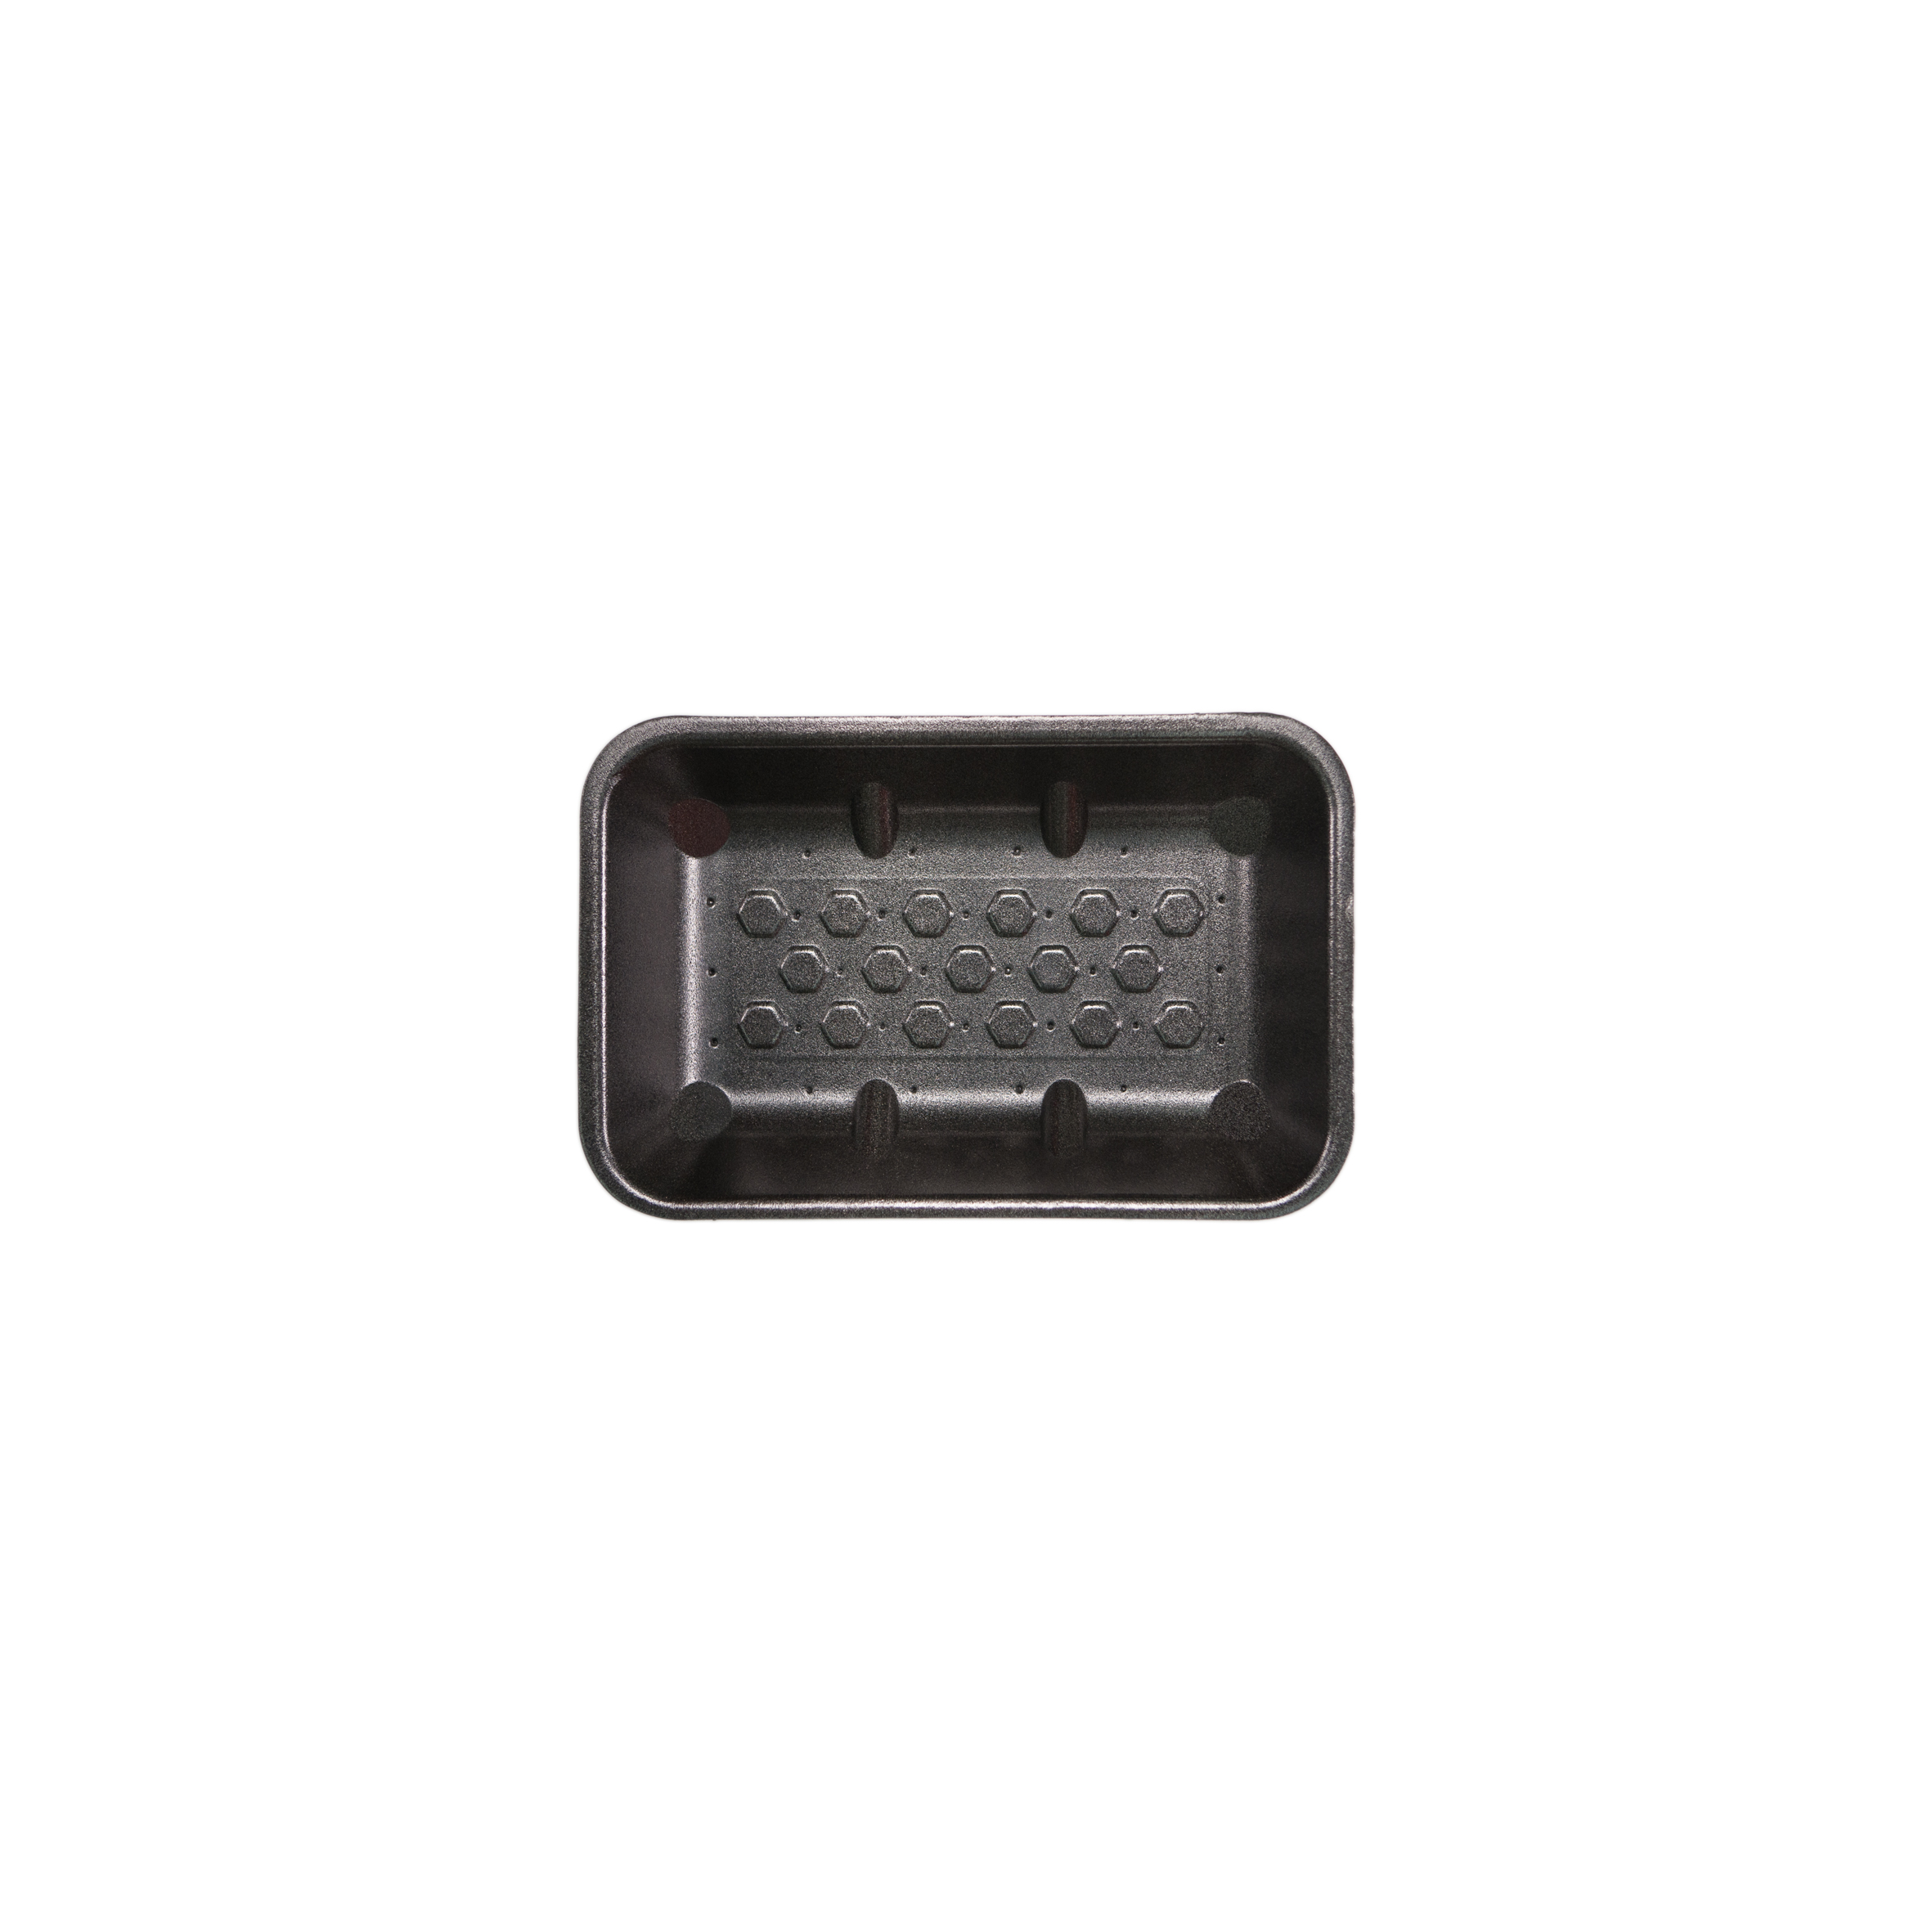 iK0103      OPEN CELL 35mm 8x5    90 per sleeve 360 per carton